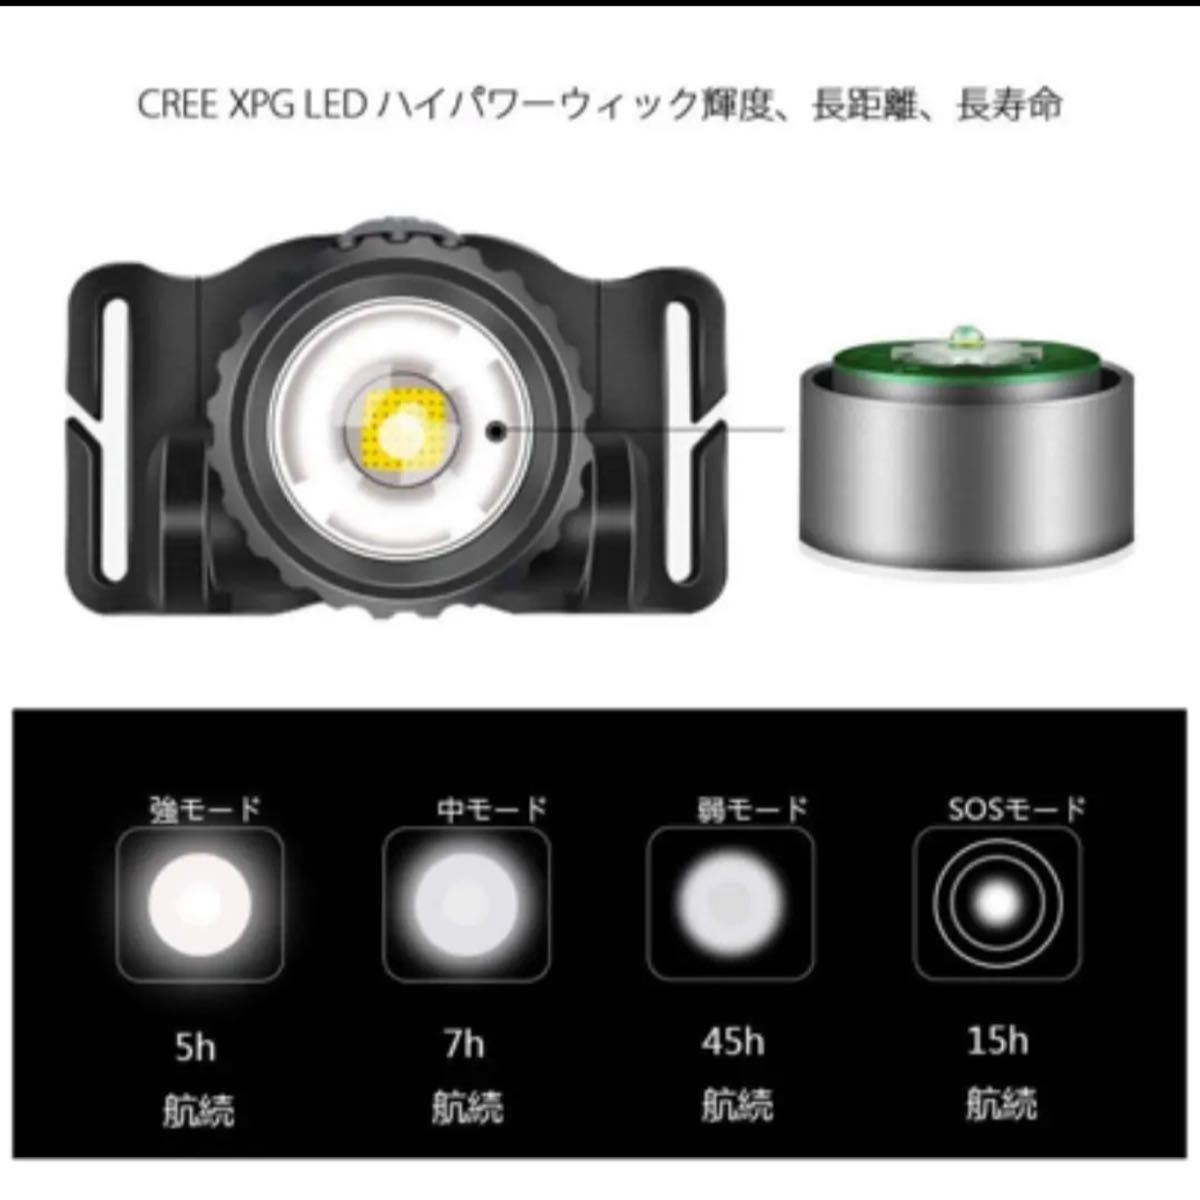 LED ヘッドライトUSB充電式ヘッドランプ 800ルーメン 防水 釣り防災